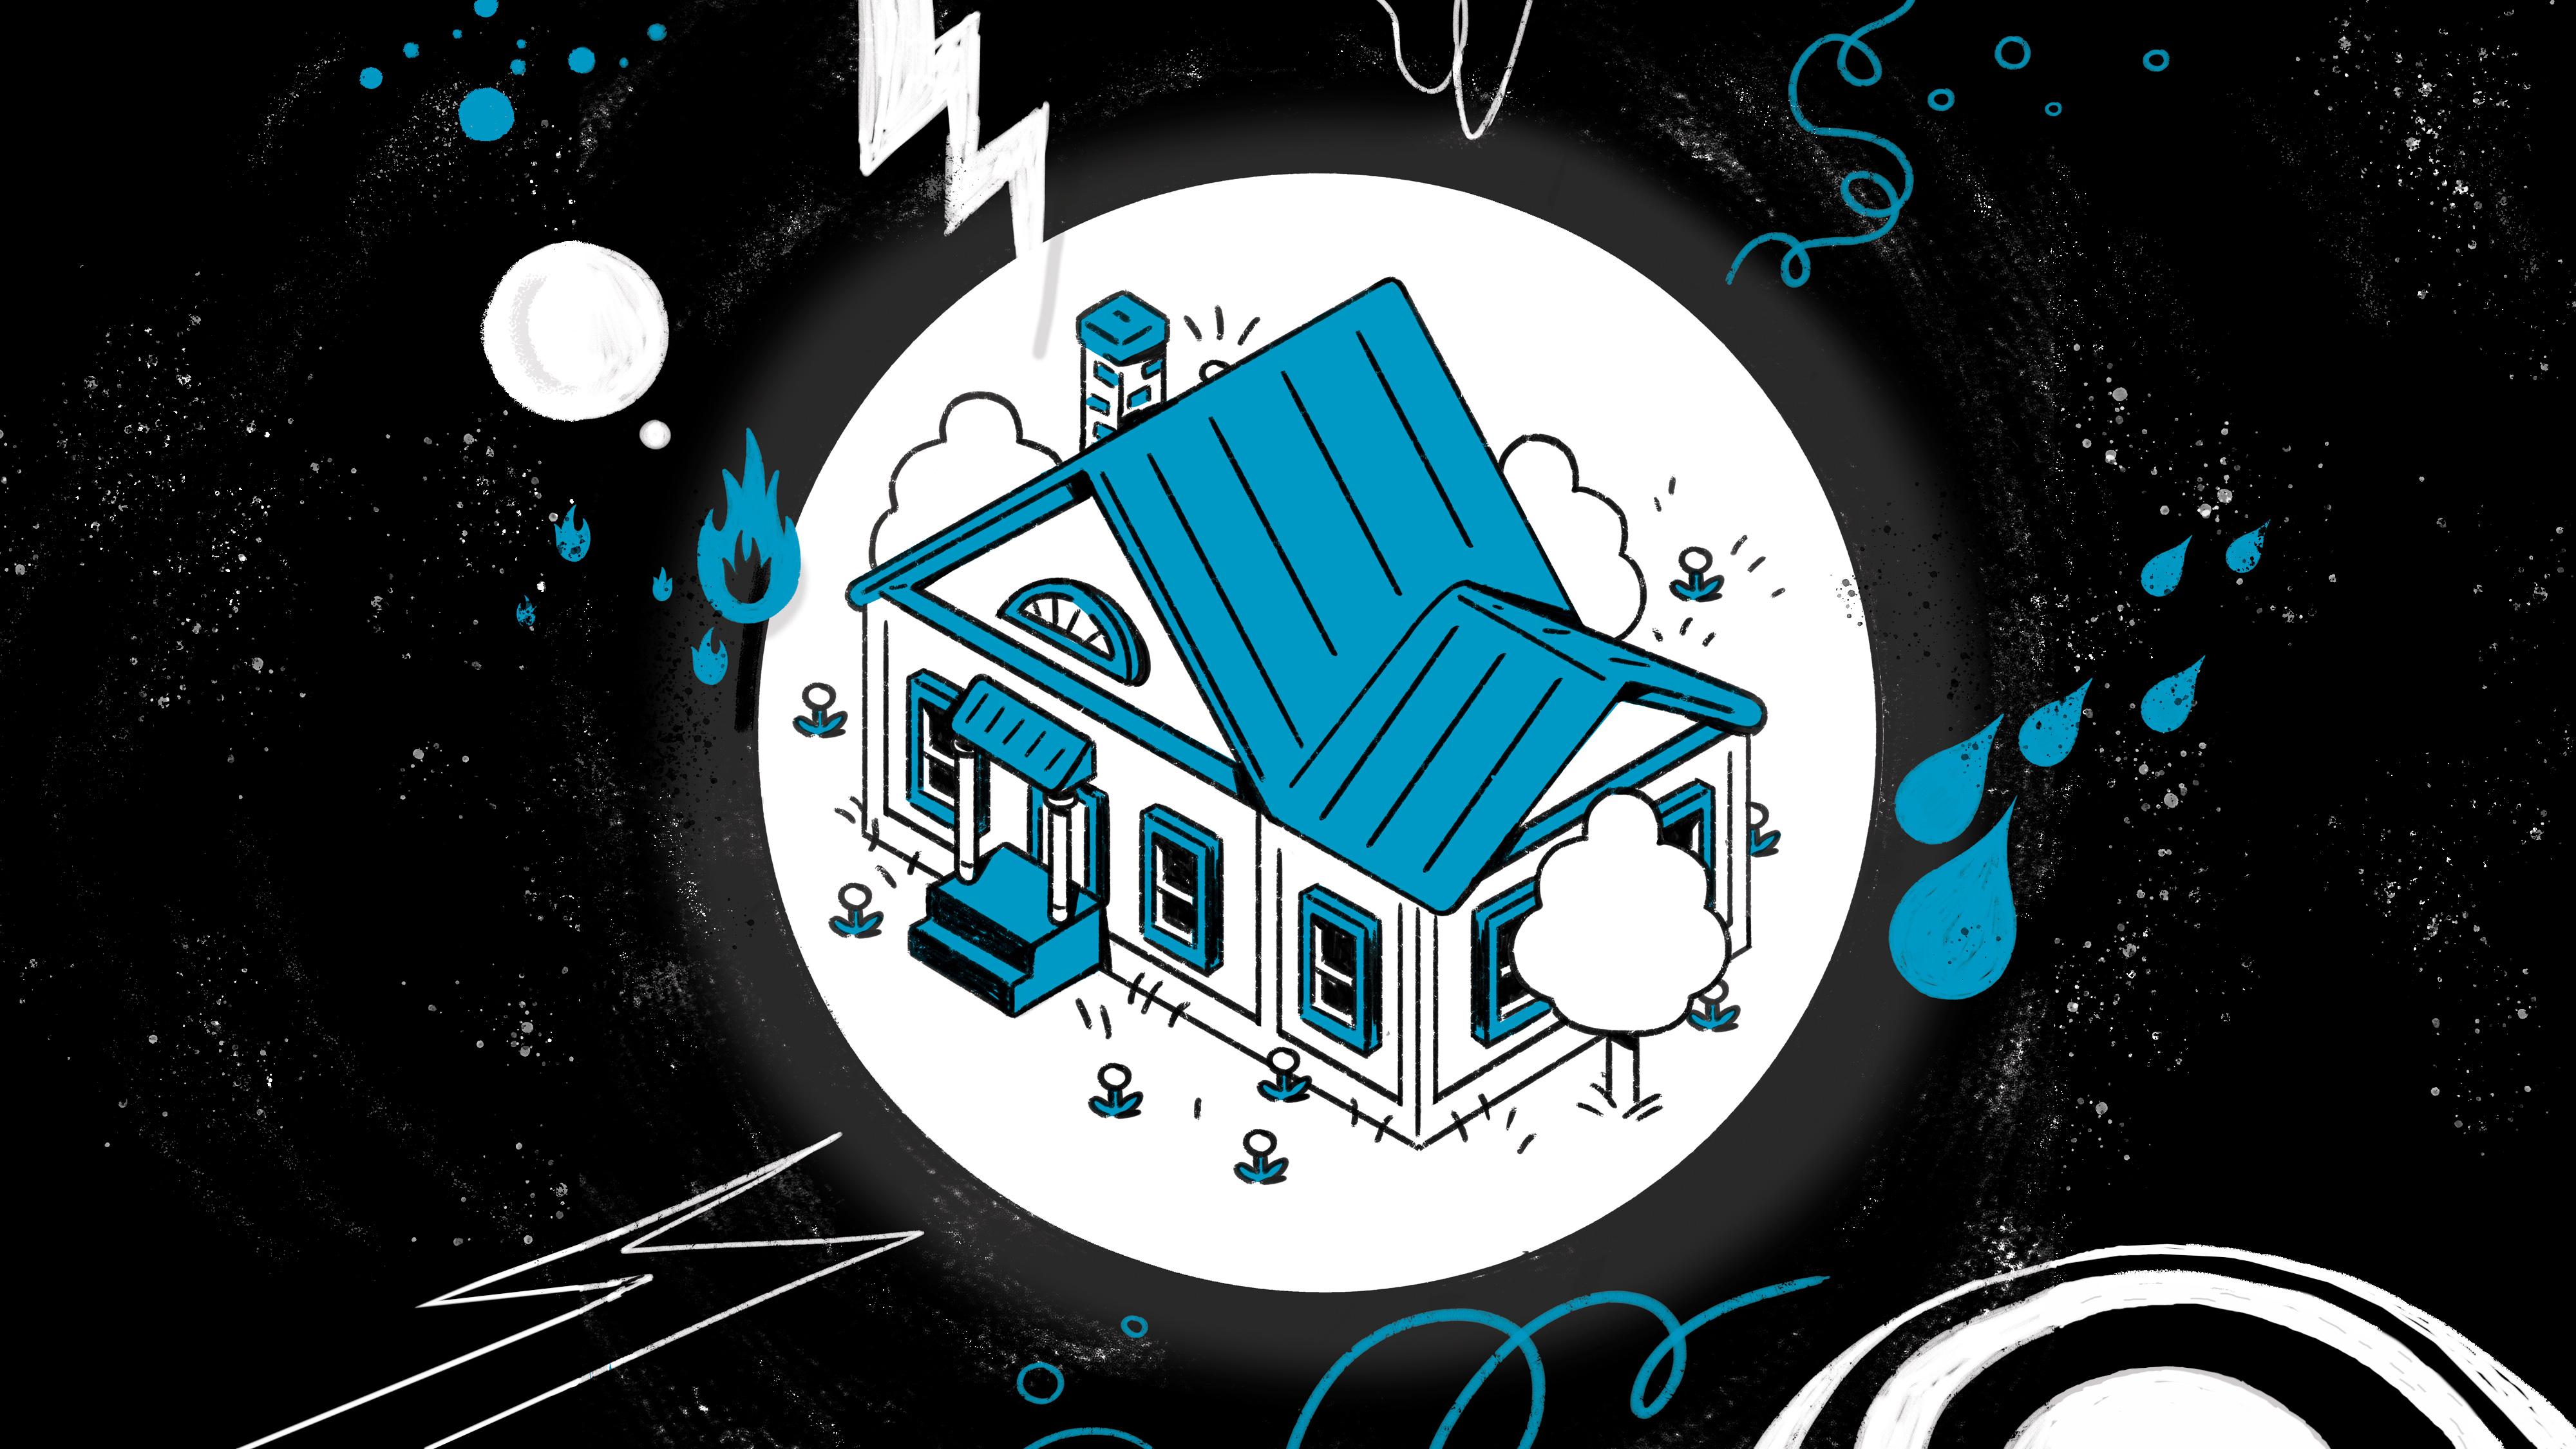 homeowner insurance illustration